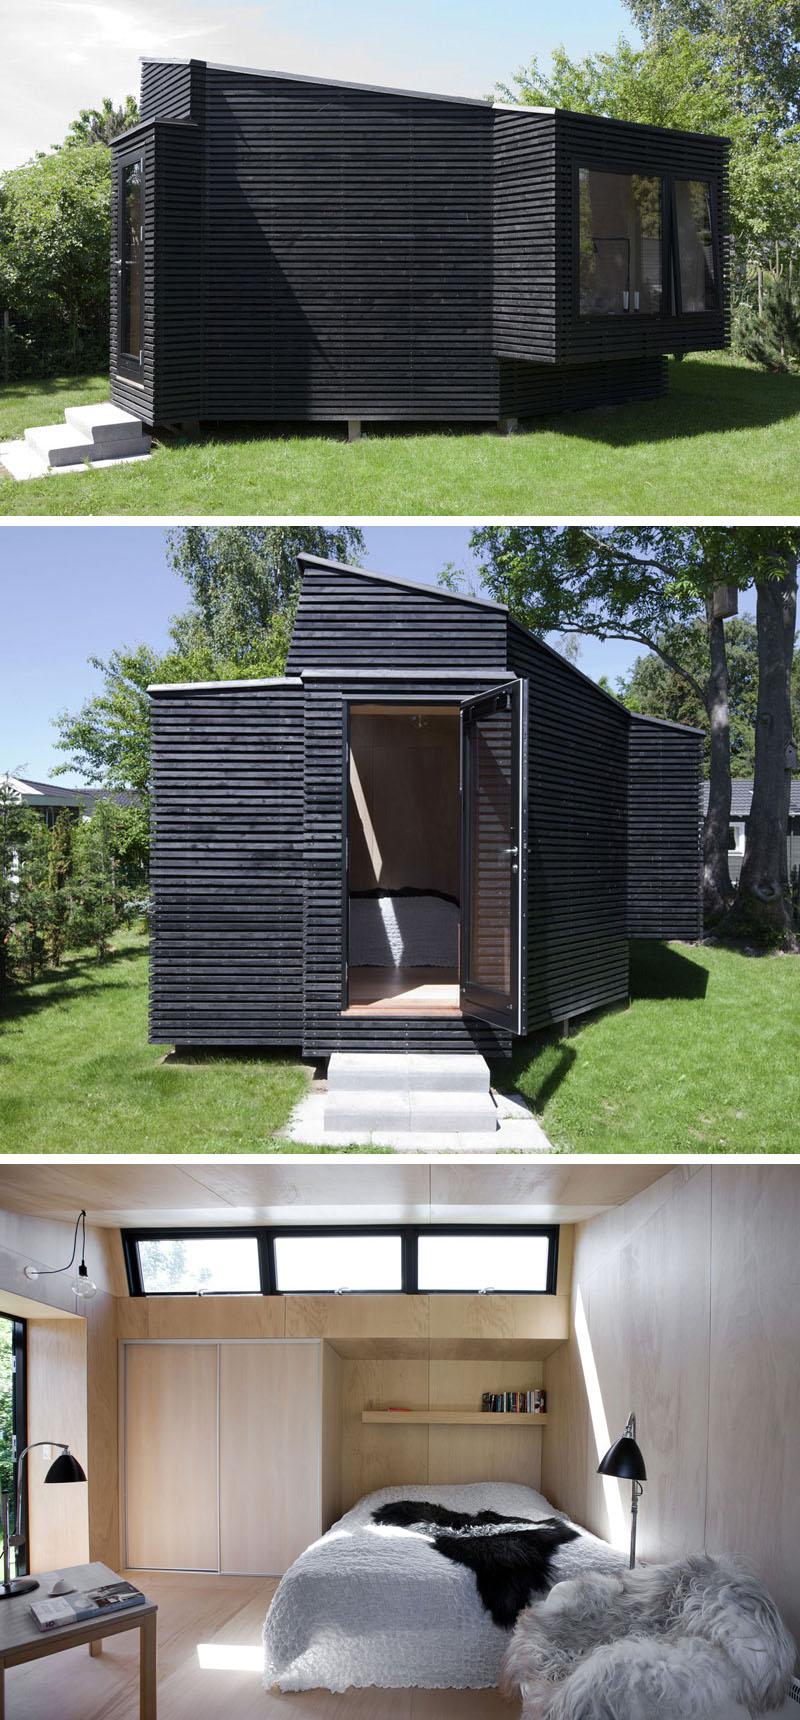 maison de jardin habitable 14 abris